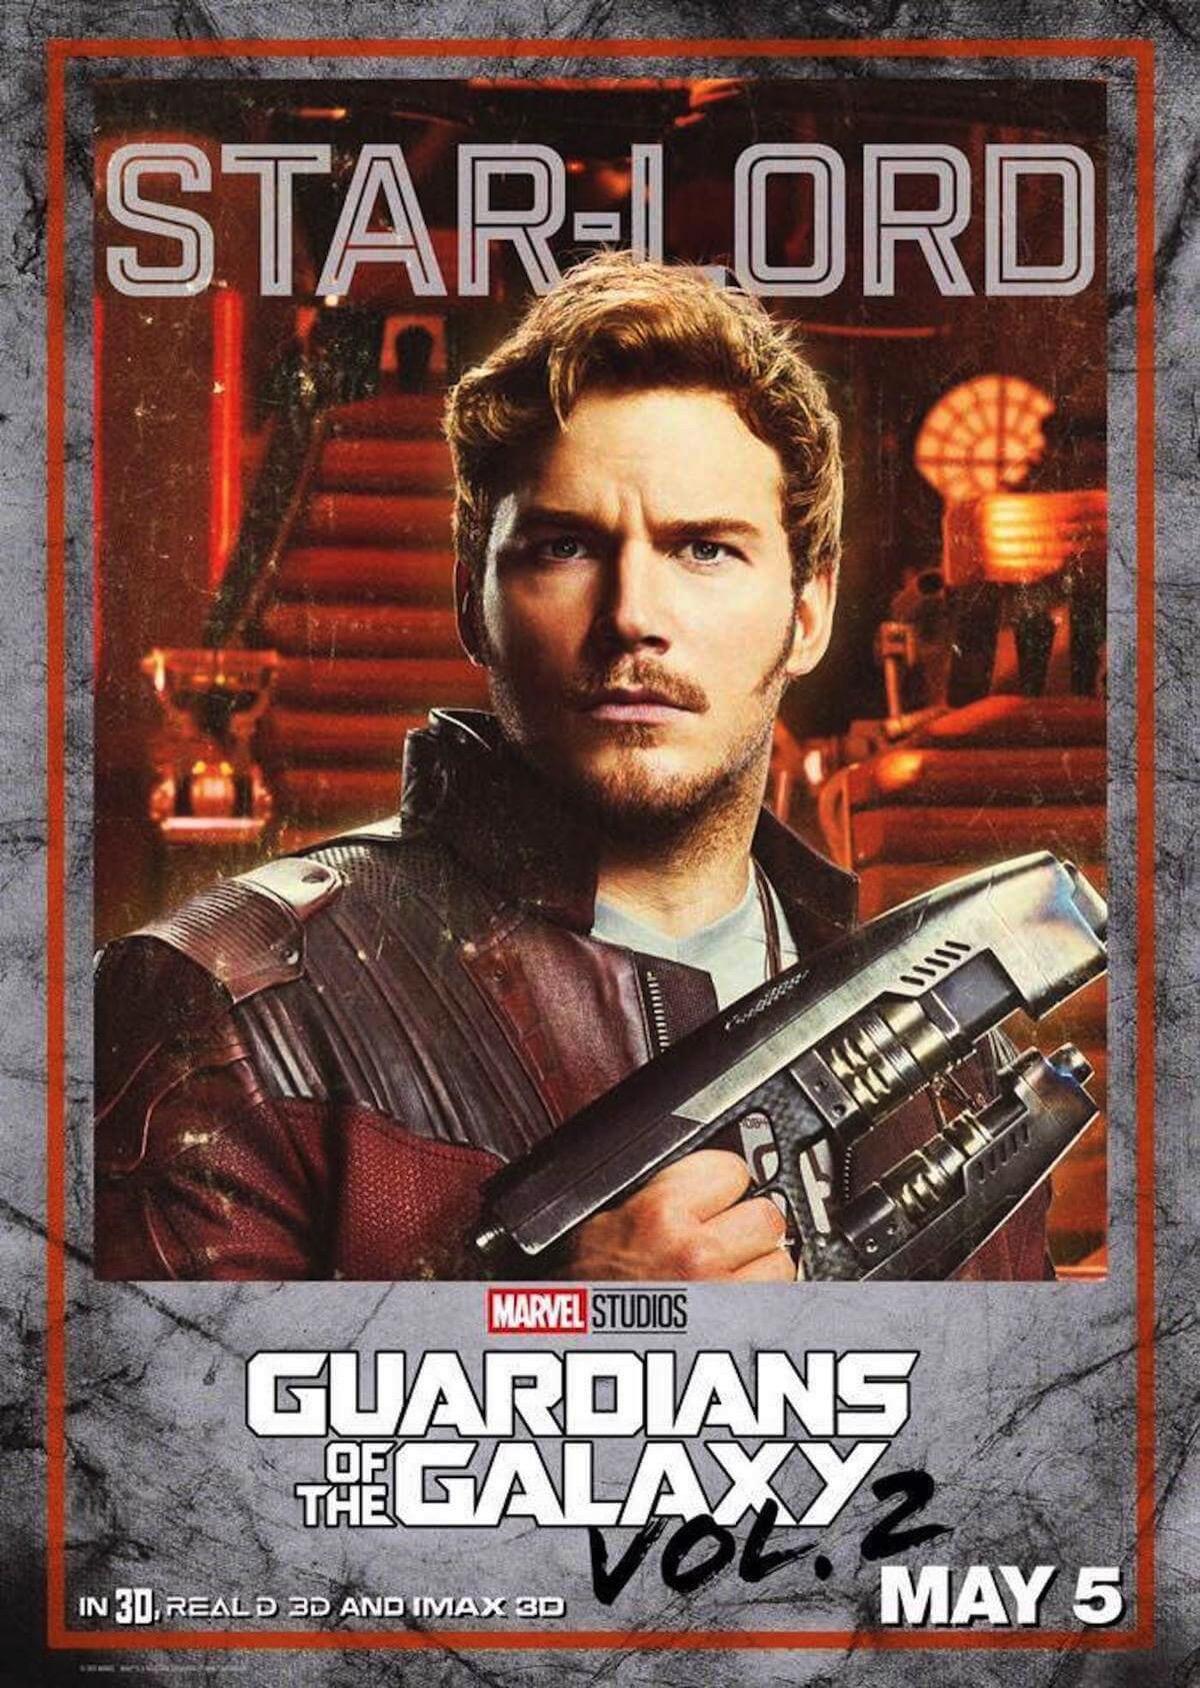 Guardians of the galaxy 2 poster star lord chris pratt